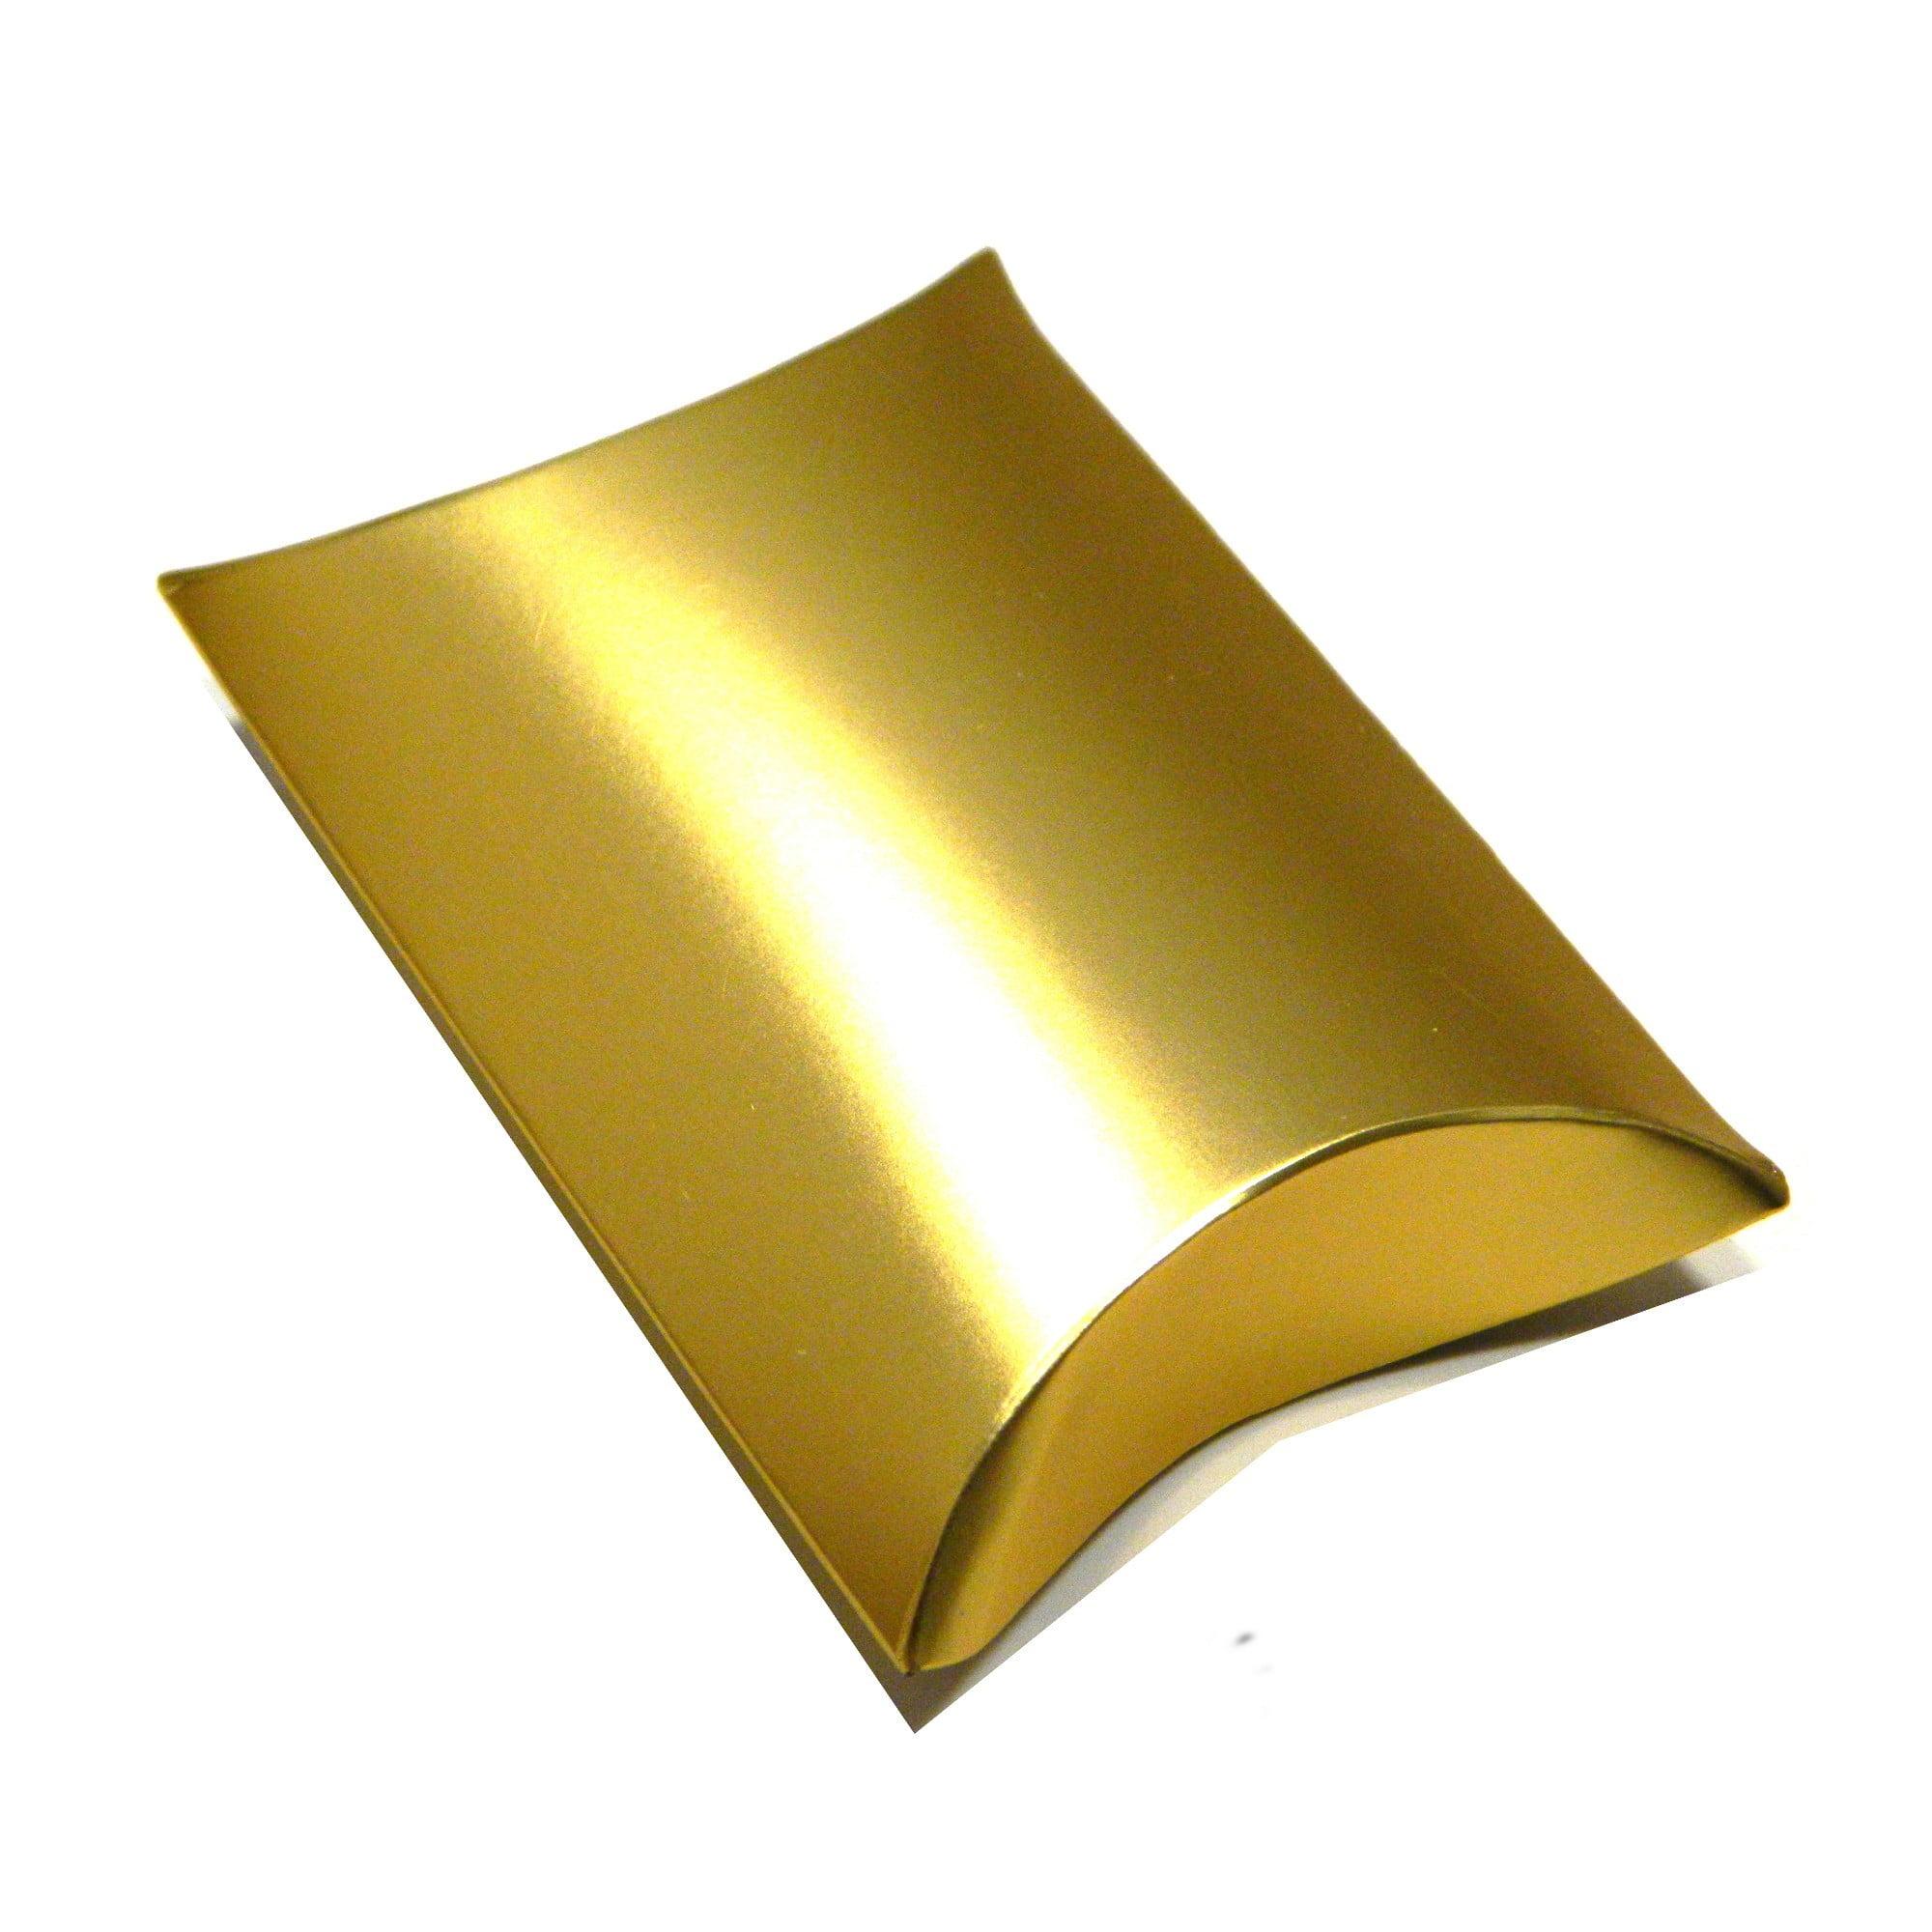 12 gold mini pillow packs gift bags ...  sc 1 st  Arran View Jewellery & 12 gold mini pillow packs gift bags for wedding favours etc | Arran ...